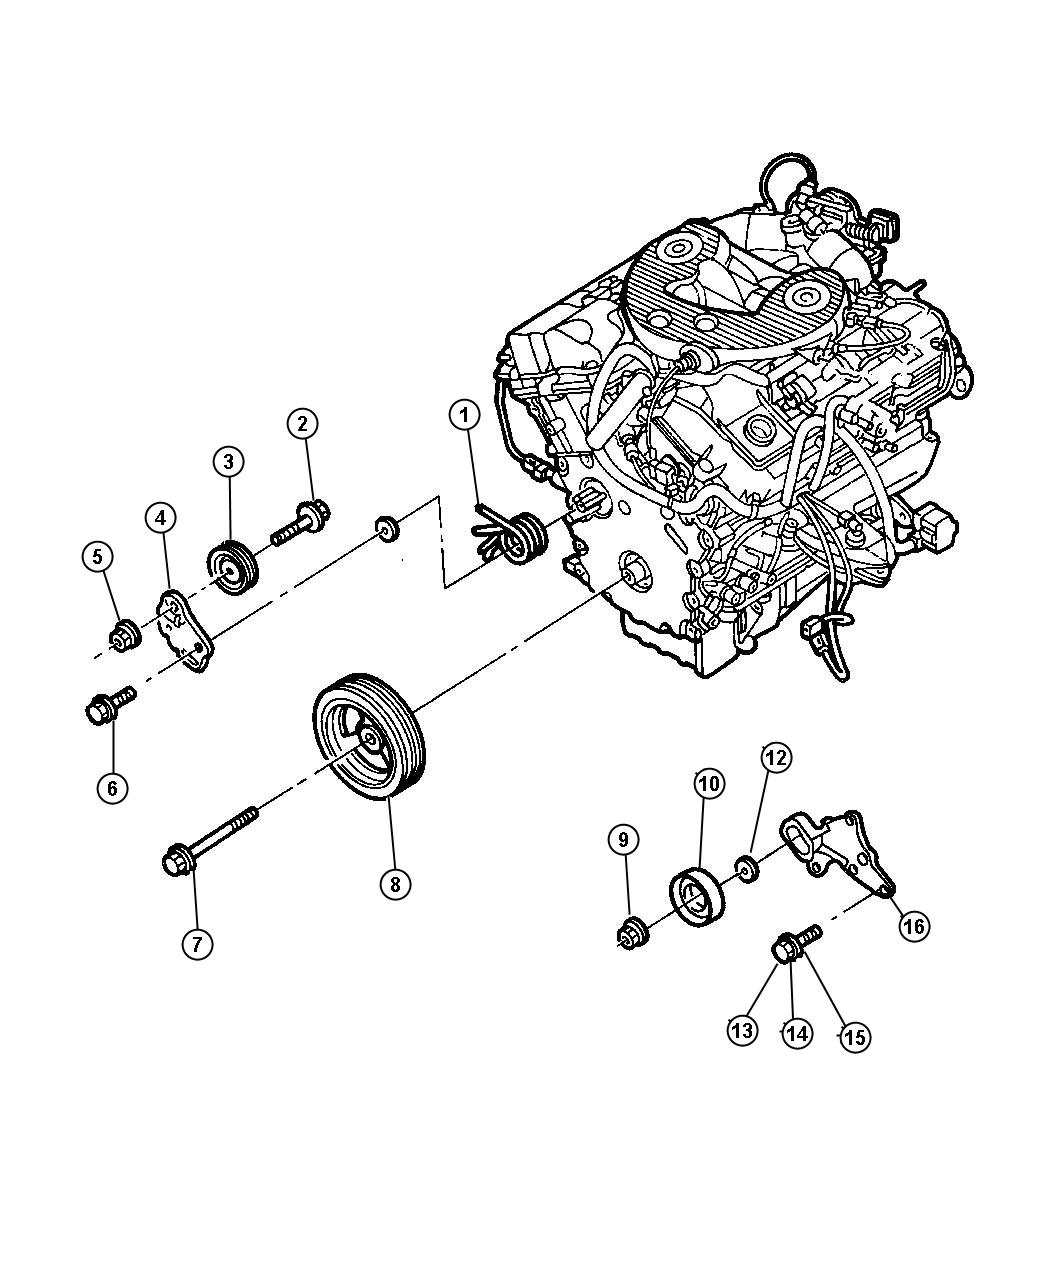 2001 Dodge Intrepid Engine Oil Sending Unit